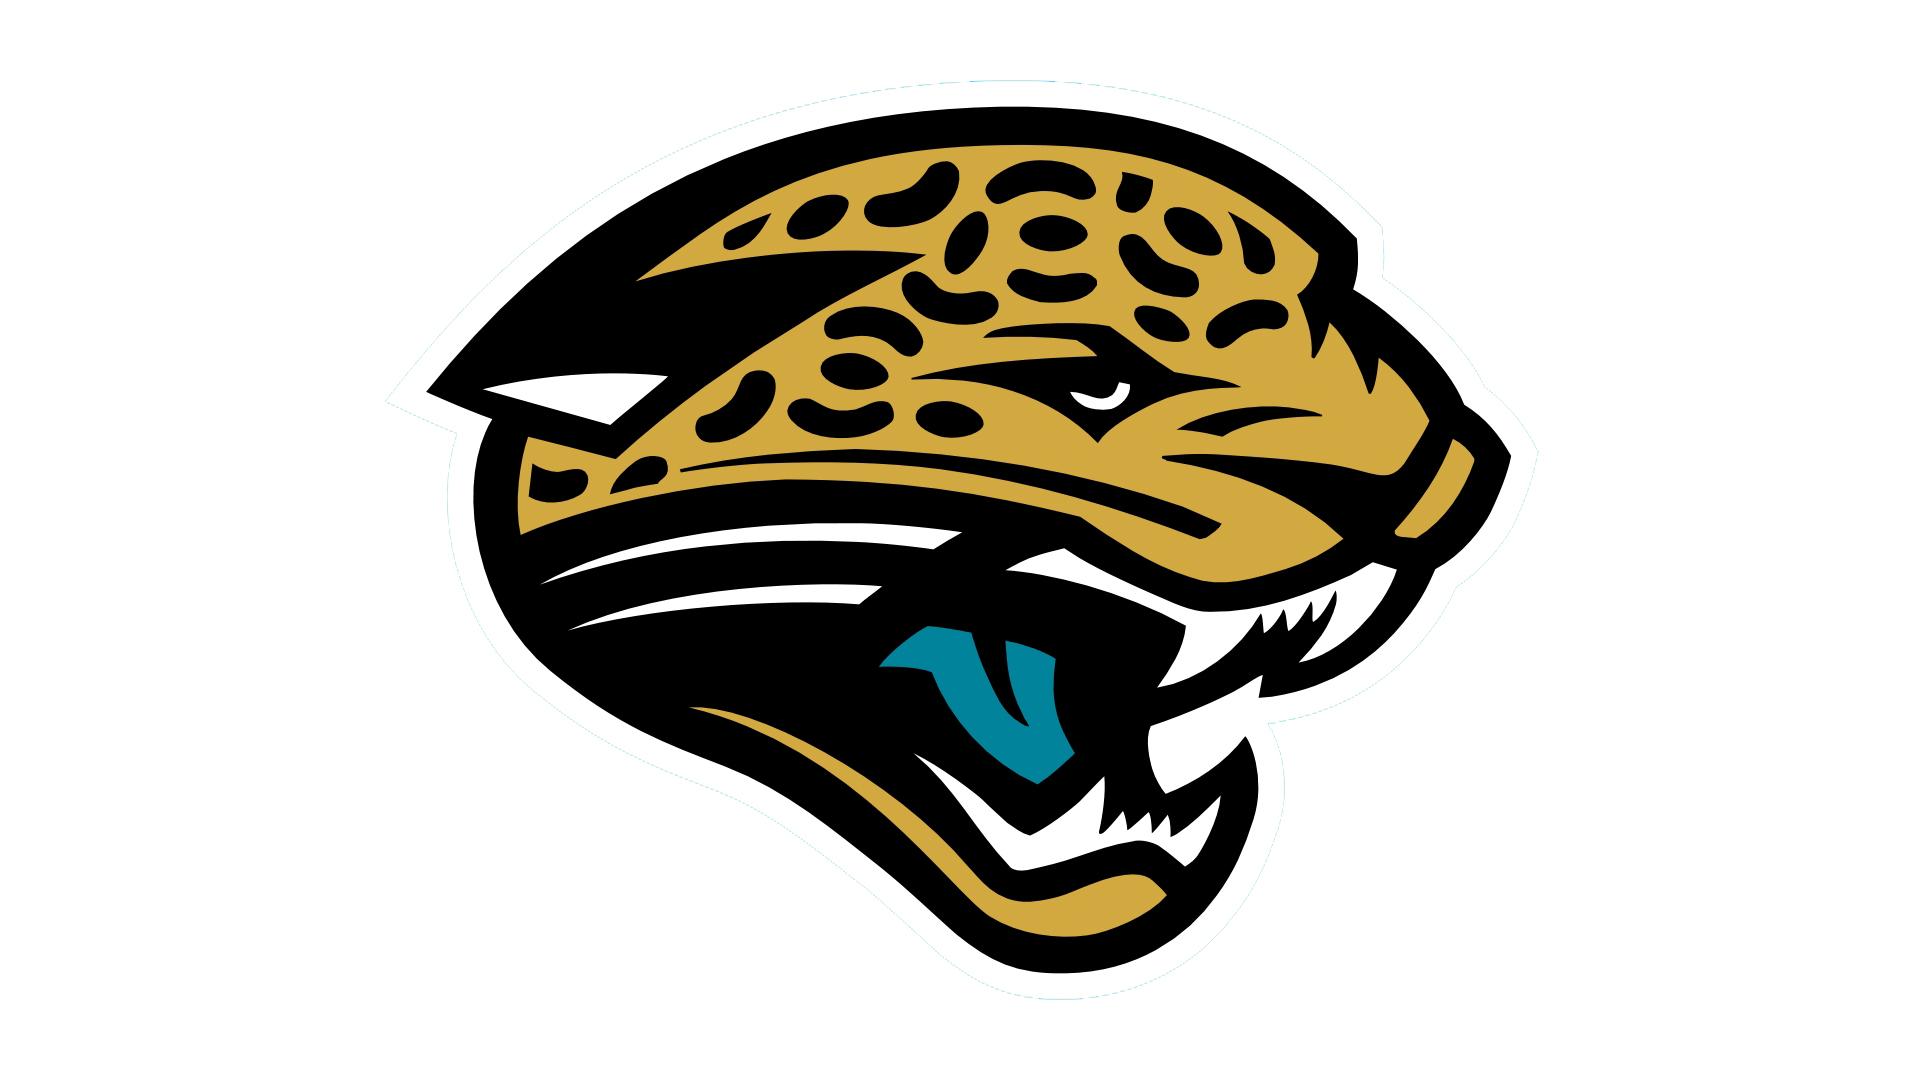 Meaning Jacksonville Jaguars logo and symbol.